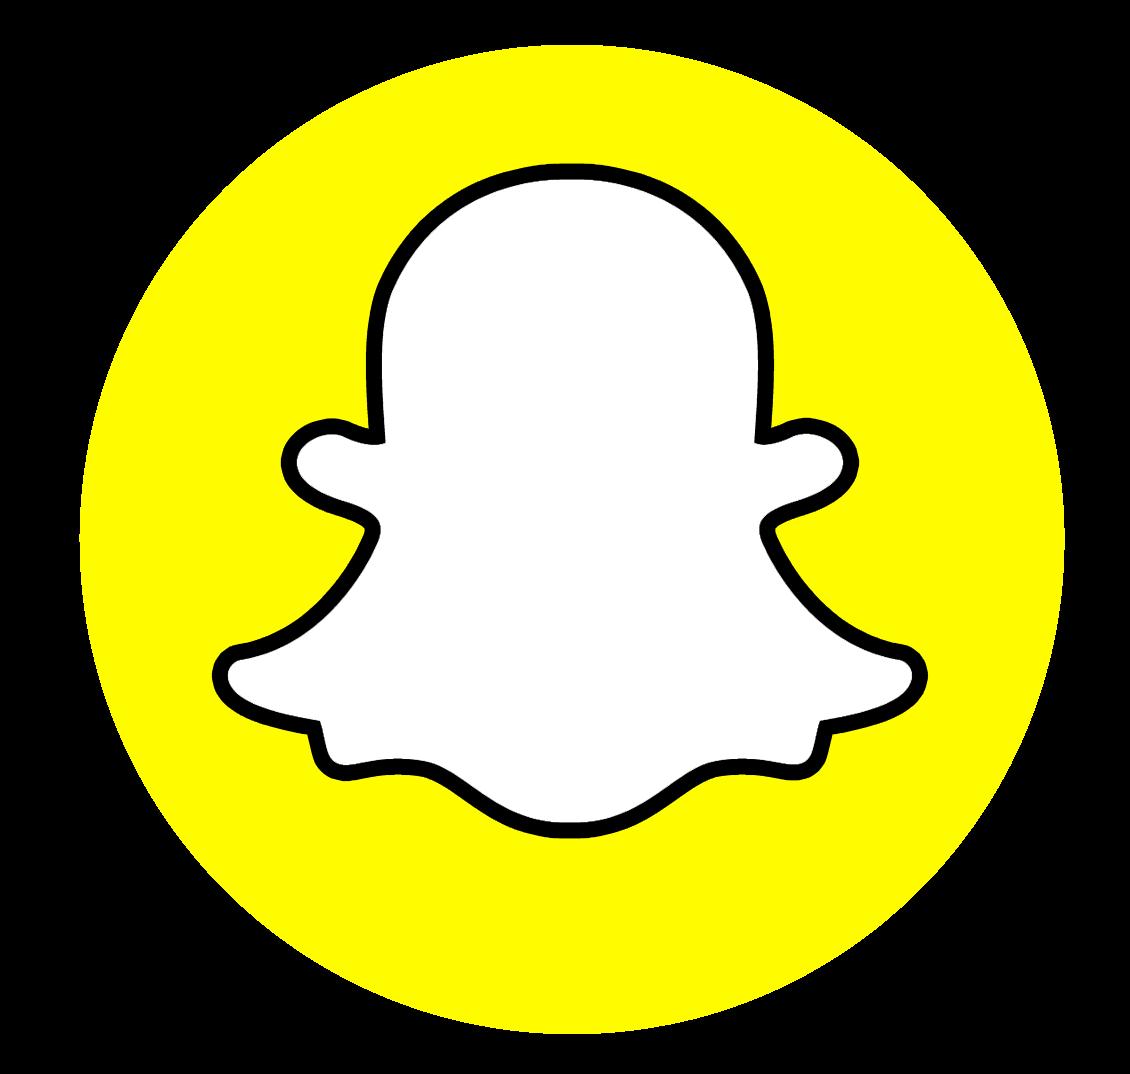 A gente também se diverte no Snapchat